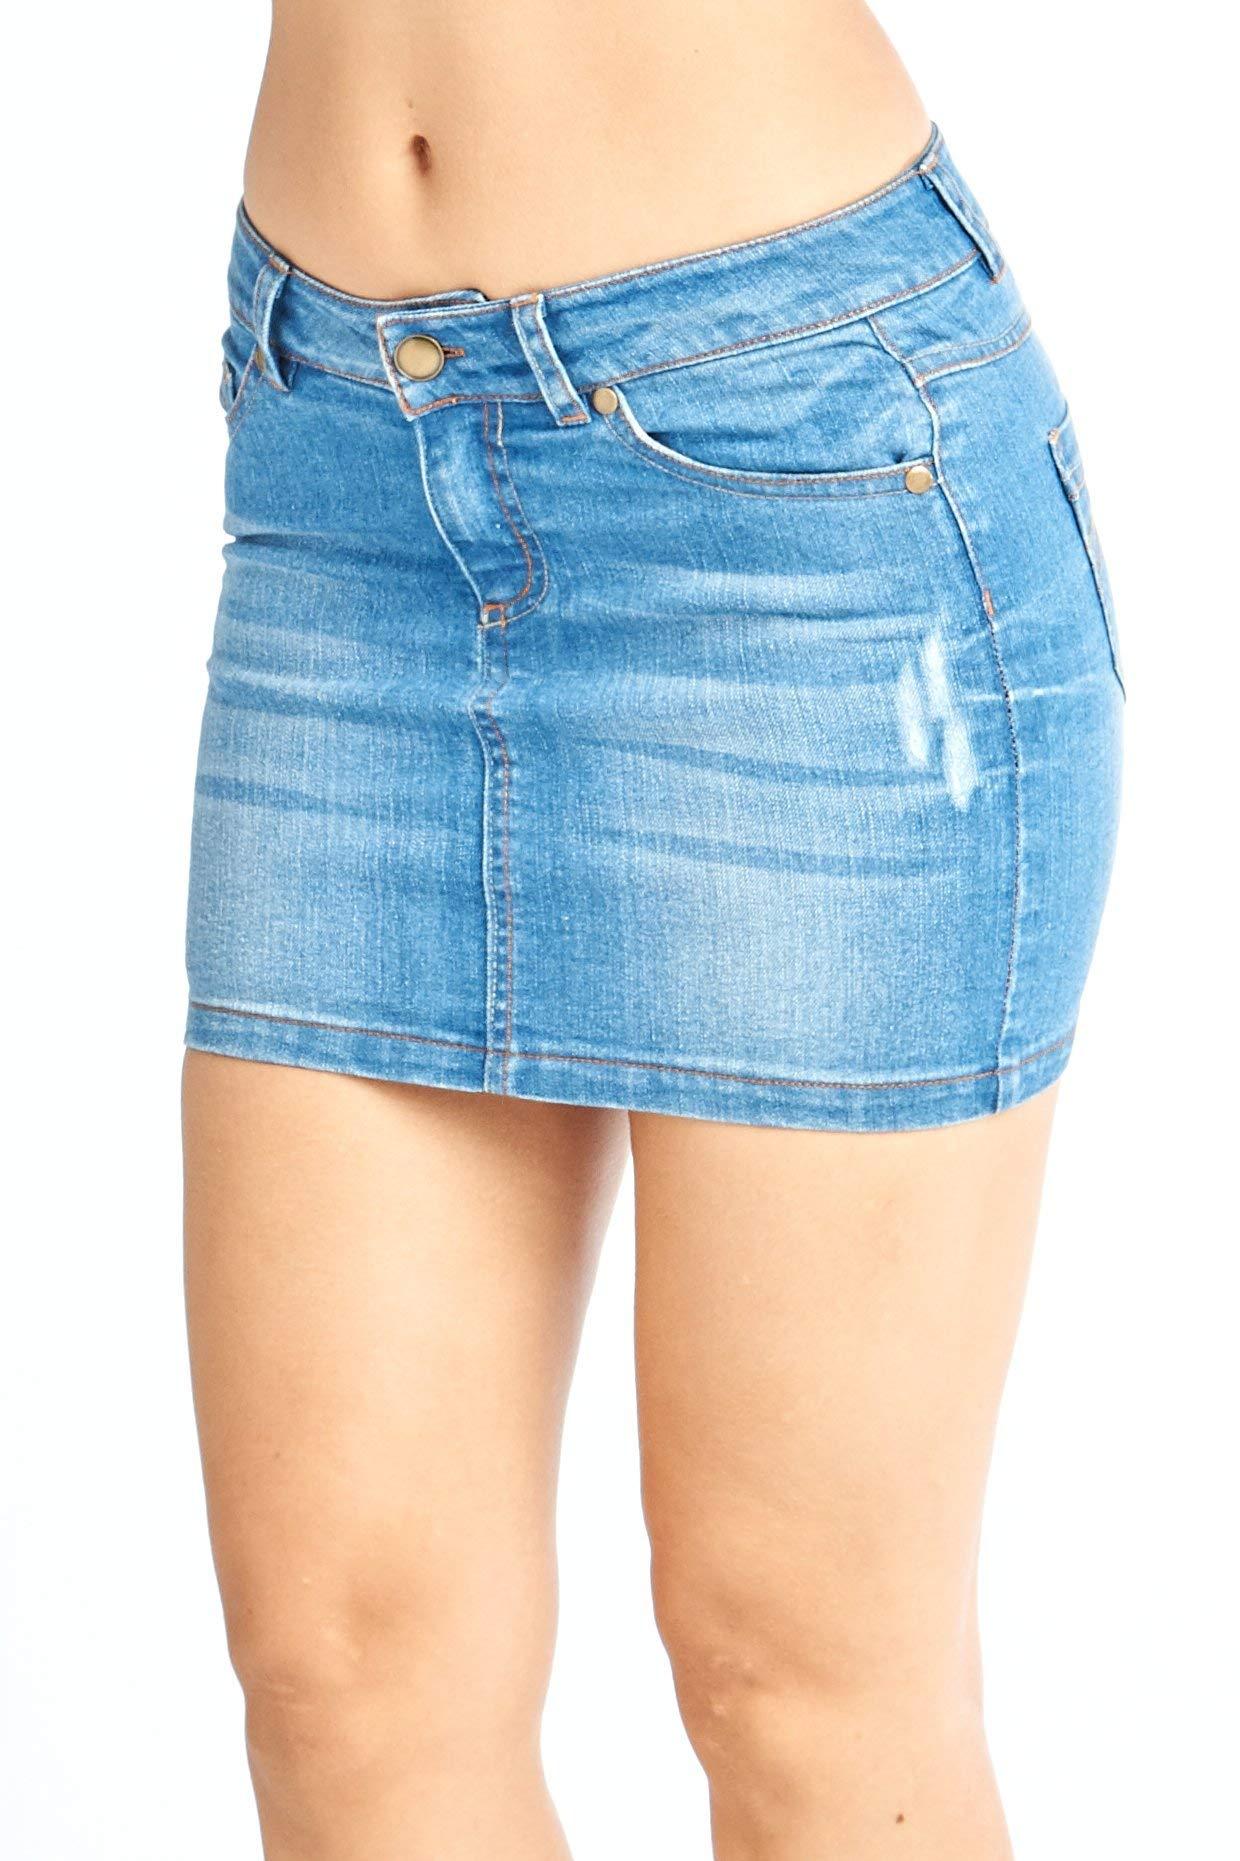 Women's Jeans Denim Mini 5 Pocket Skirts Juniors 5